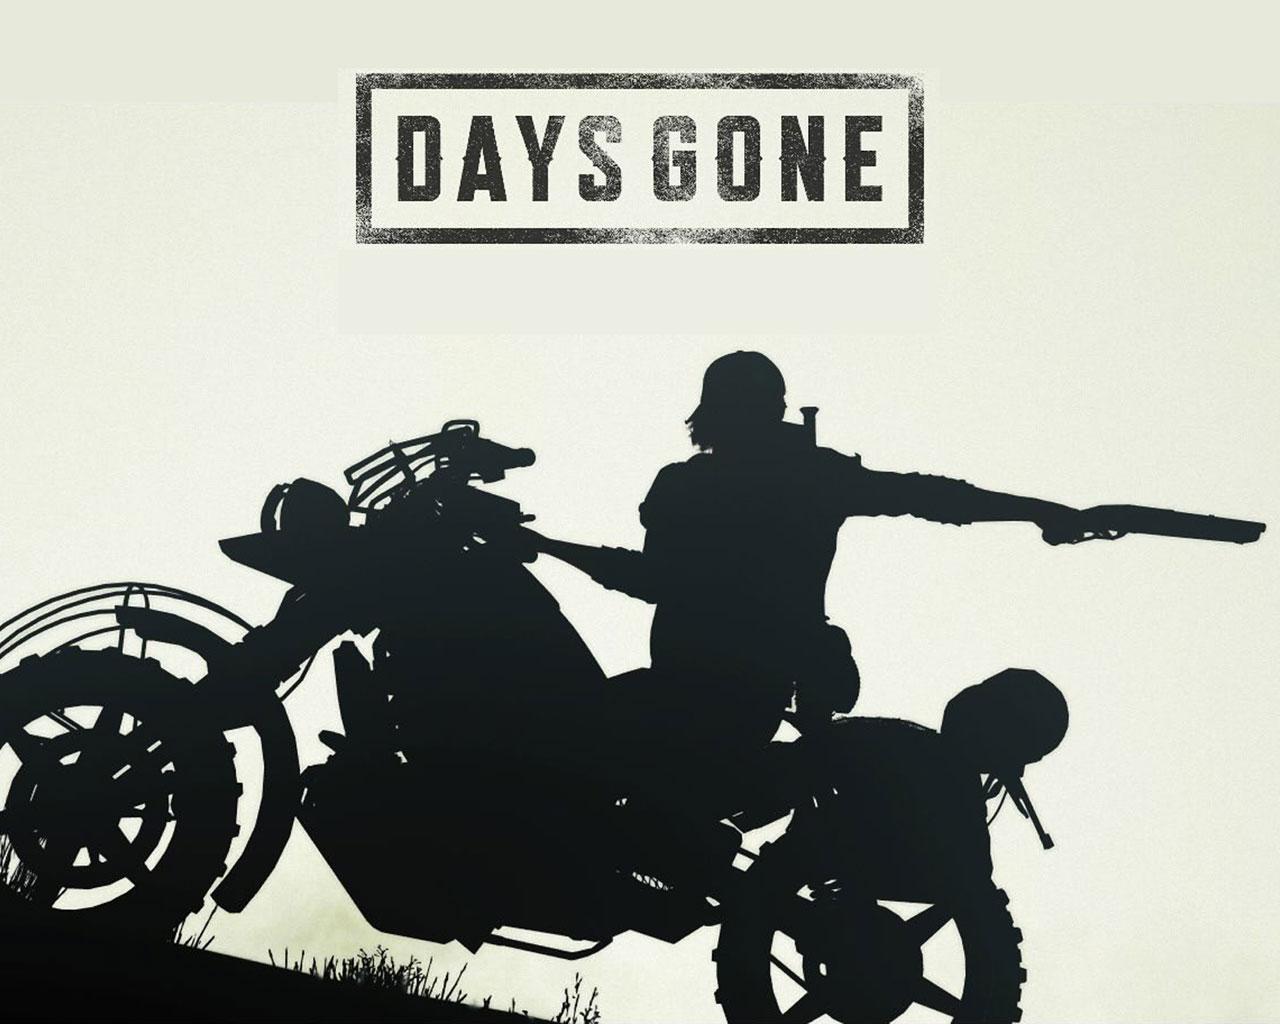 Free Days Gone Wallpaper in 1280x1024